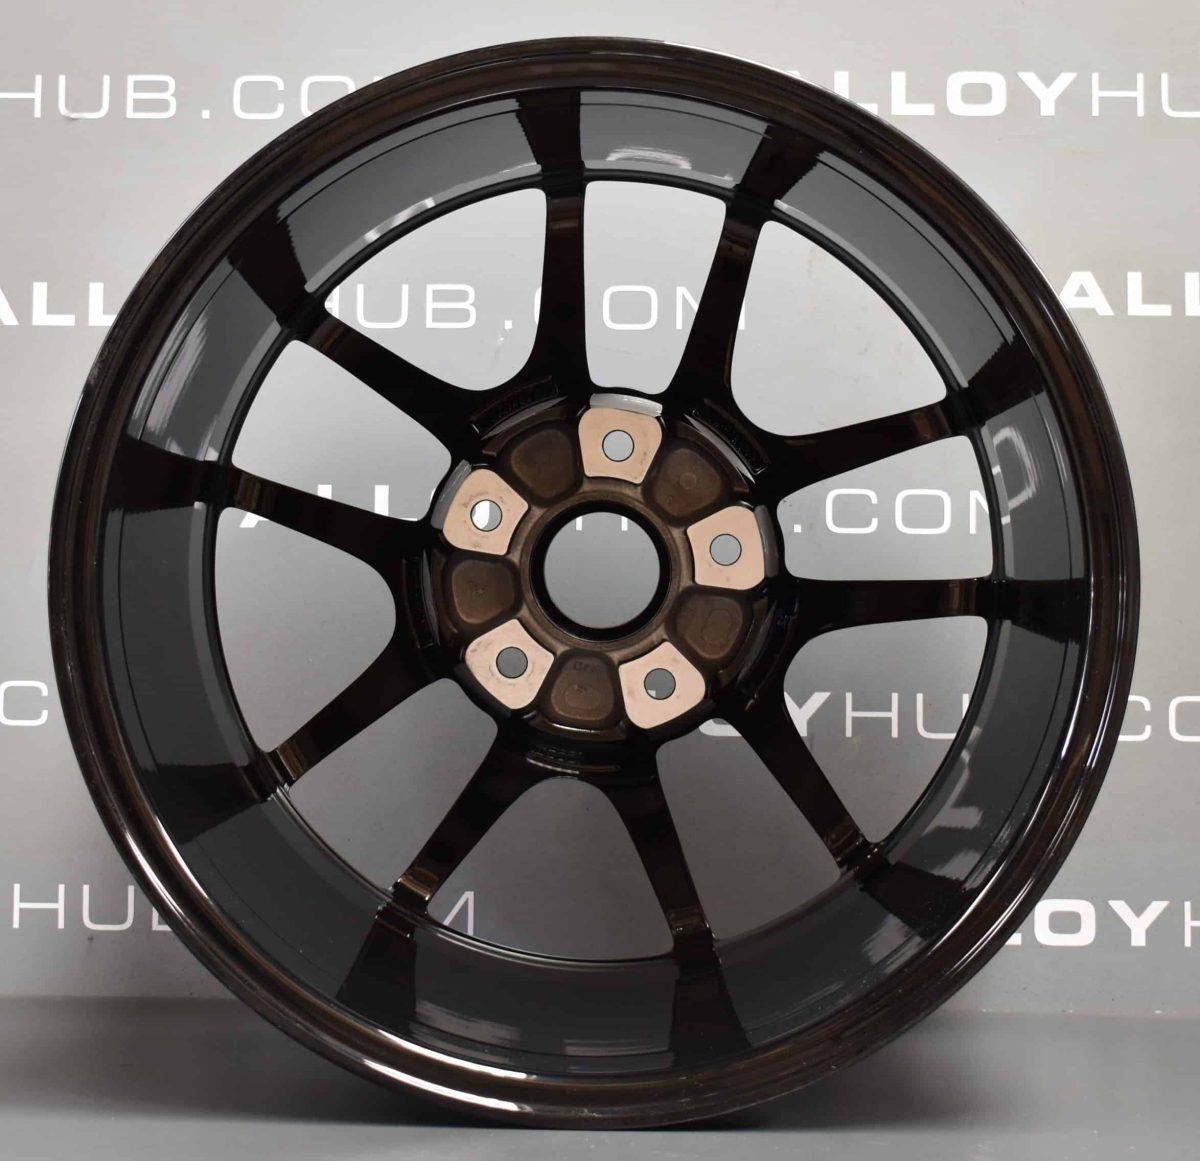 "Genuine Porsche Cayman 5 Twin Spoke 18"" inch Alloy Wheels with Gloss Black Finish 98136212004 98136212204"